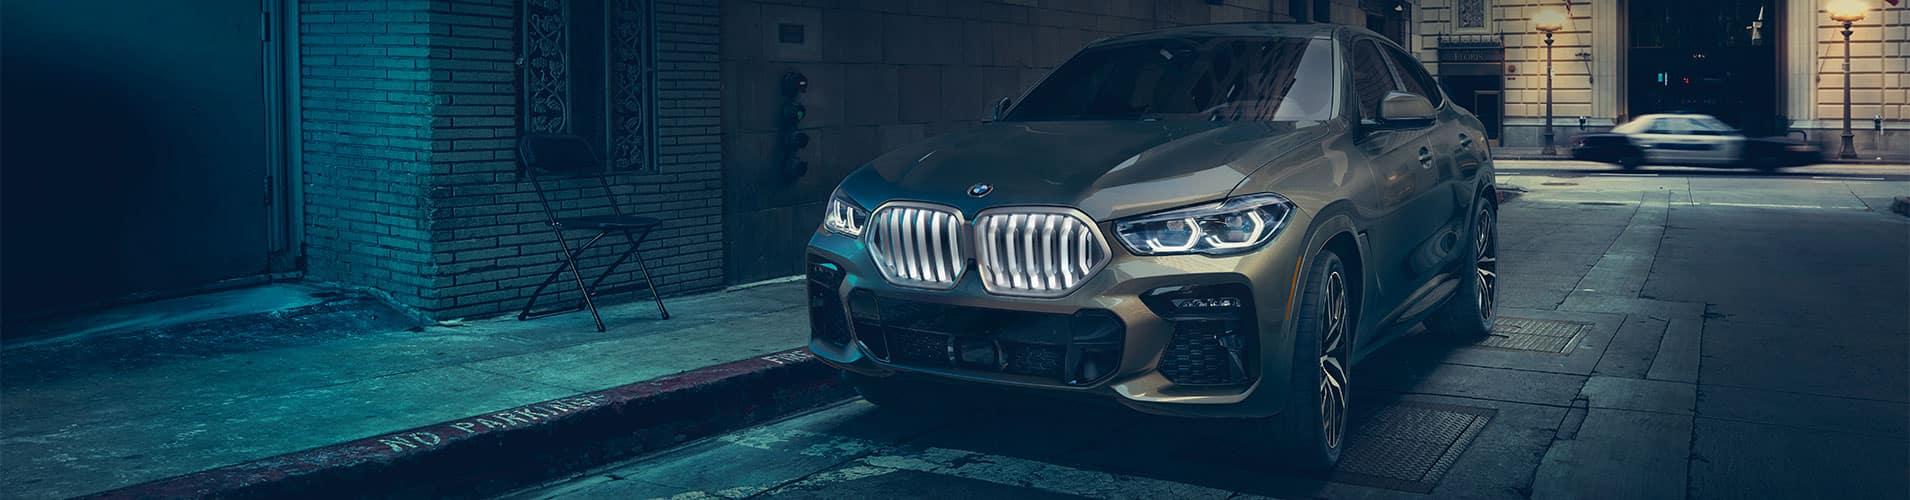 BMW X6 PHOTO  90 DAYS UNTIL FIRST PAYMENT